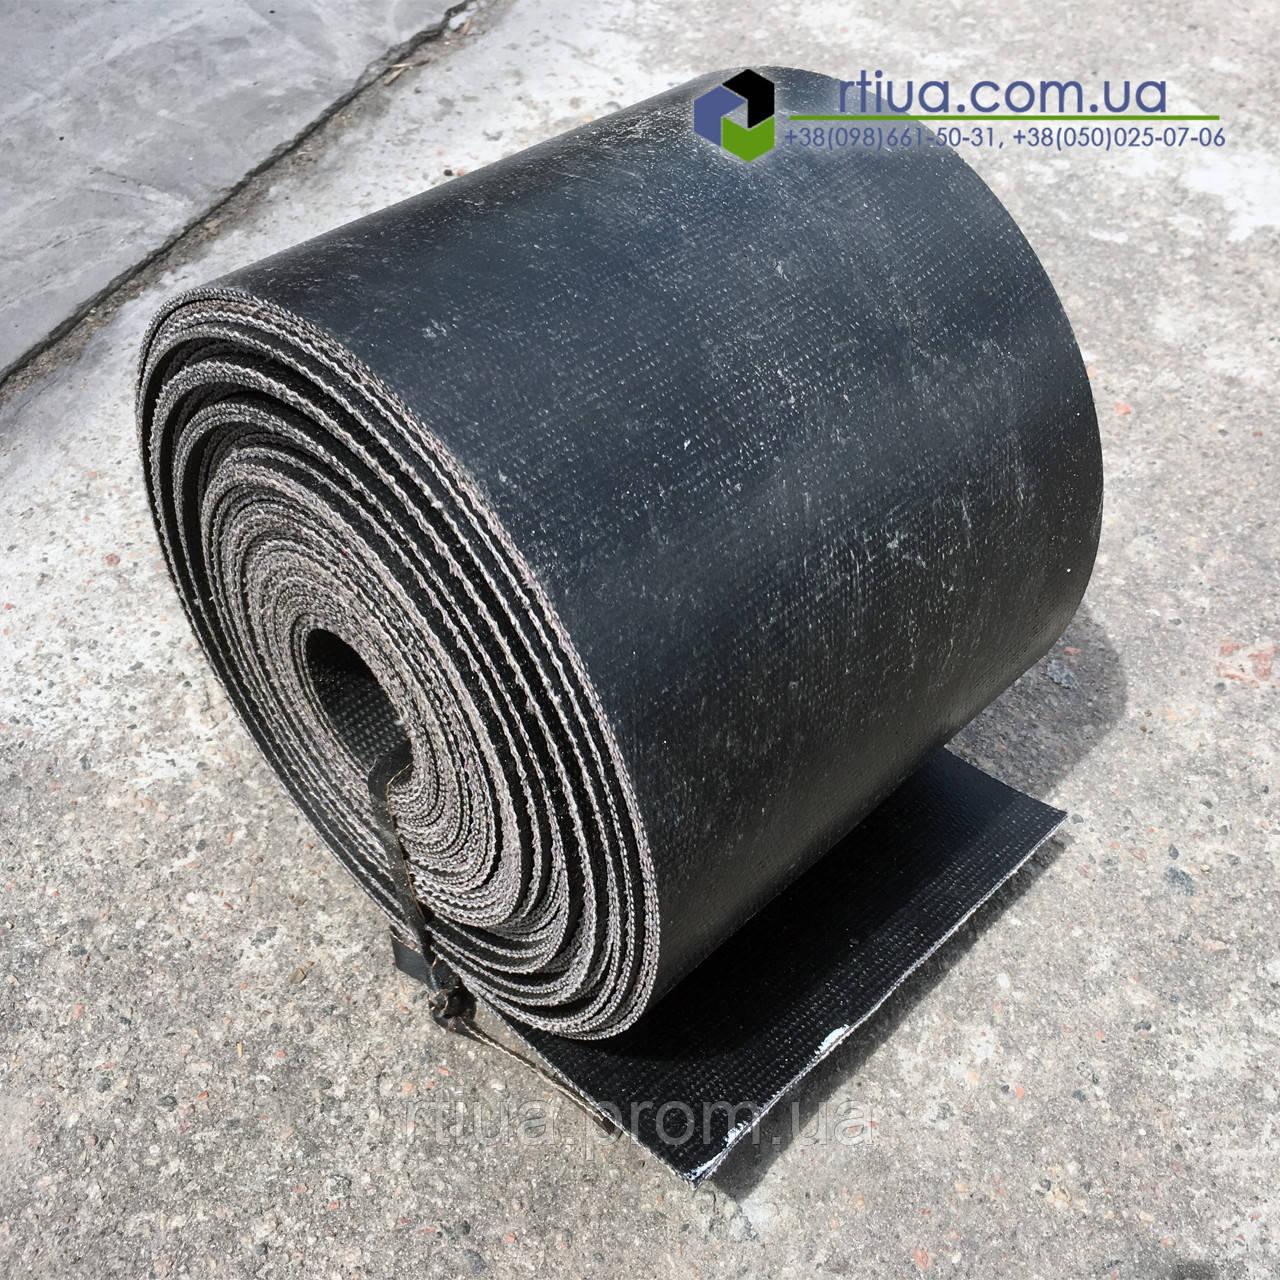 Транспортерная лента ТК-200, 1000х3 - 5/2 (10 мм)